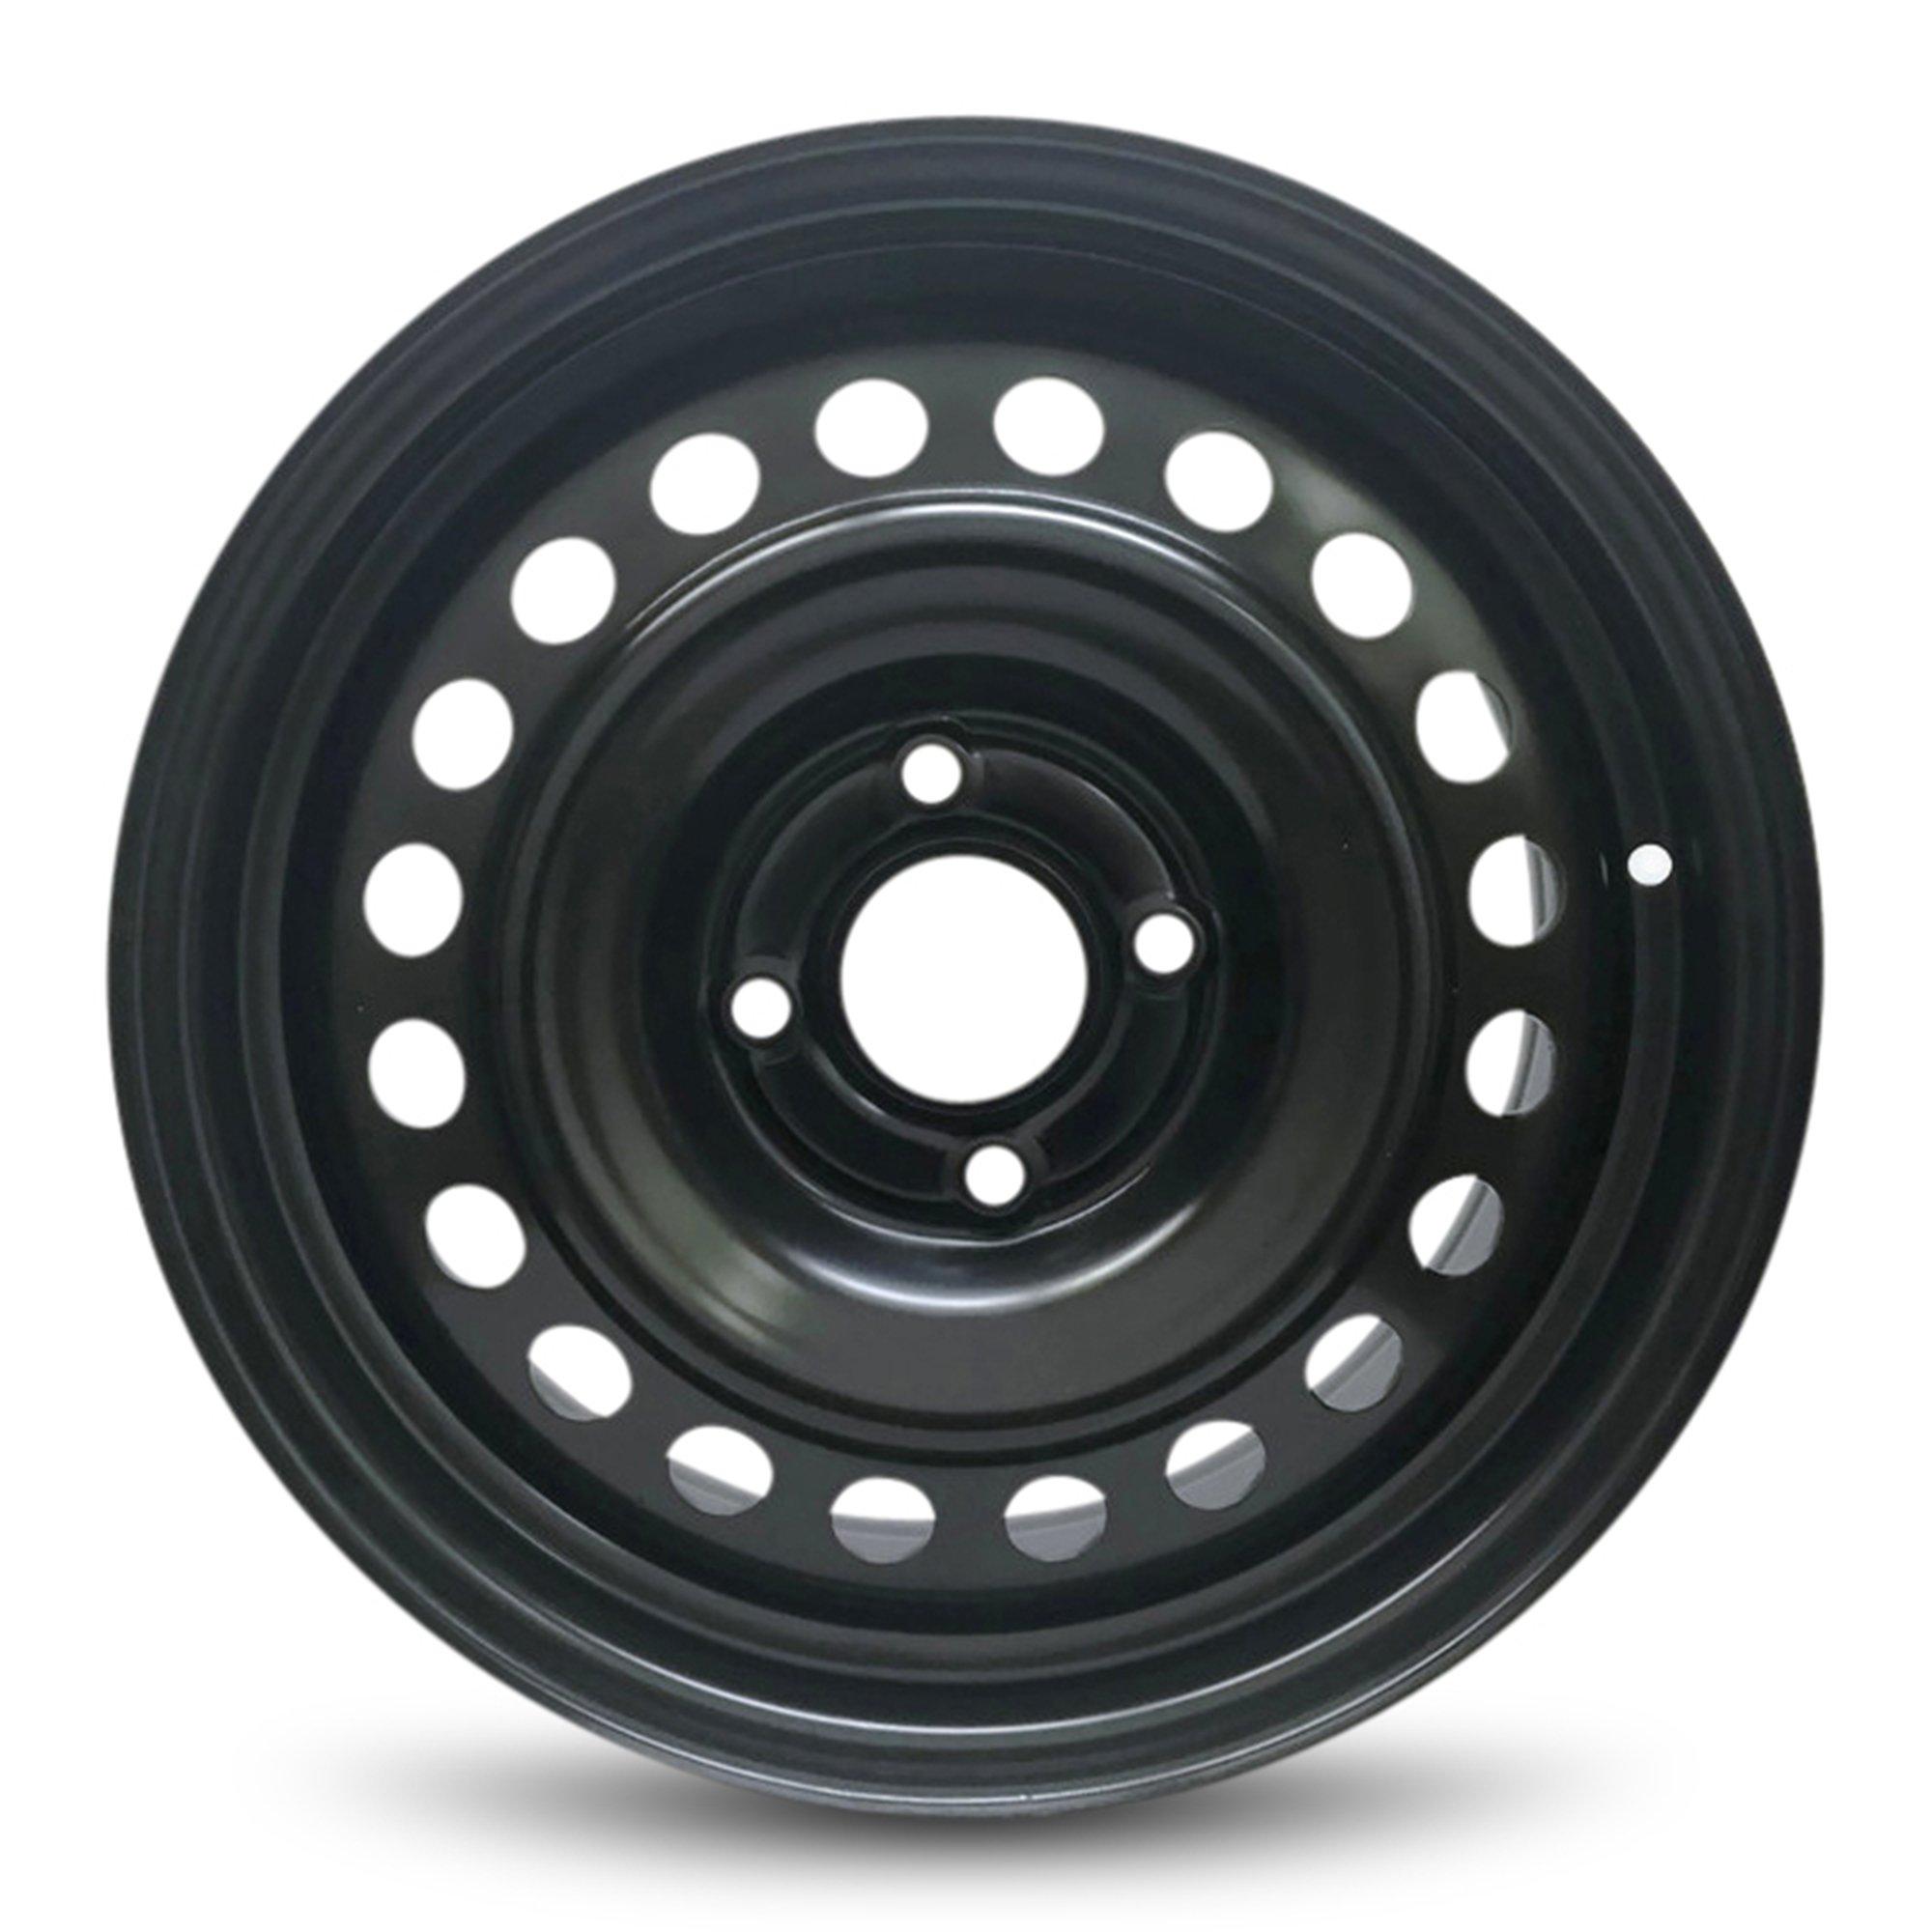 Nissan Sentra 16'' 4 Lug Steel Wheel/16x6.5 Steel Rim